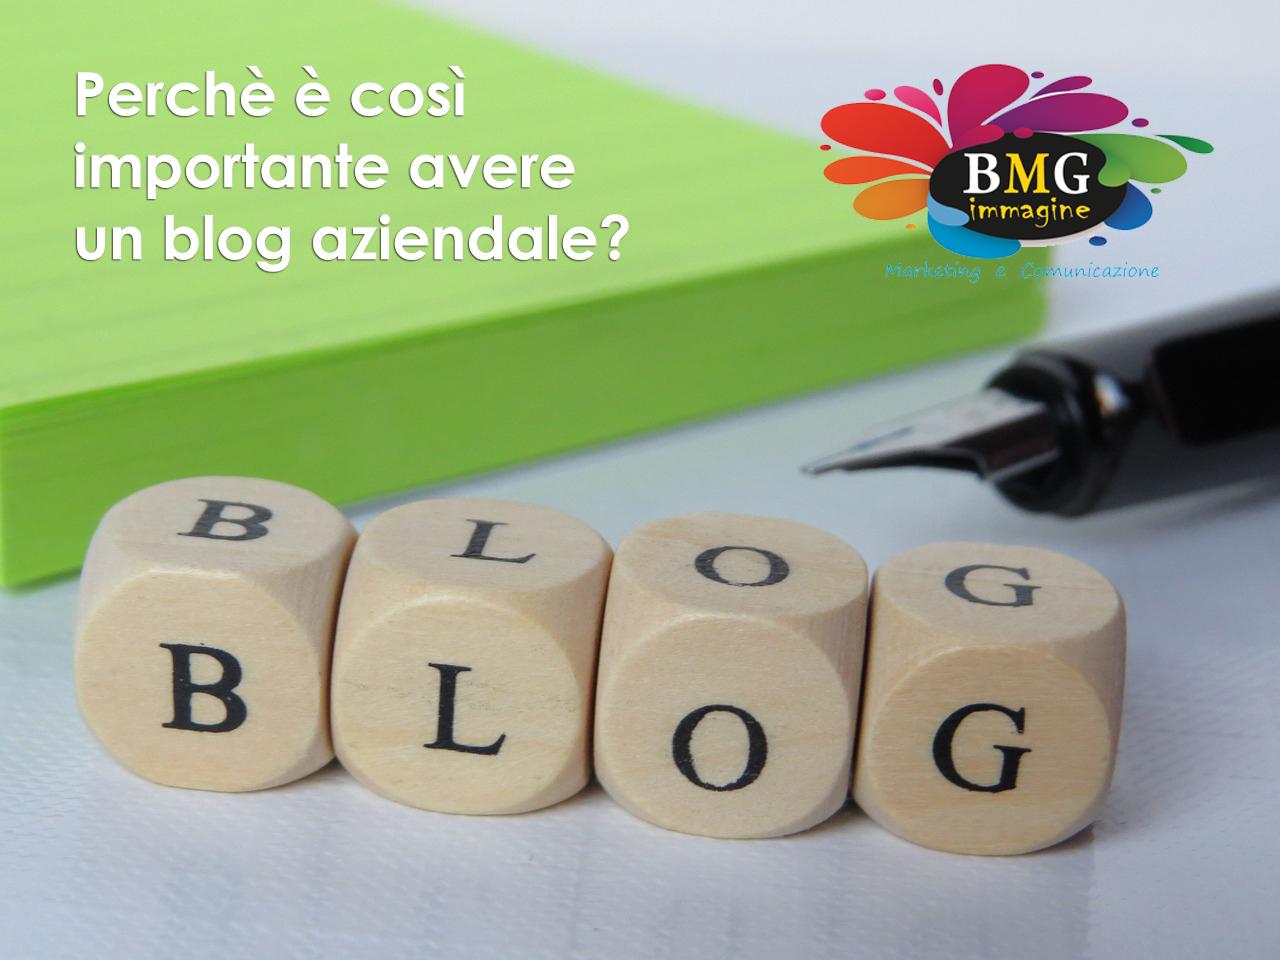 Perchè è così importante avere un blog aziendale?